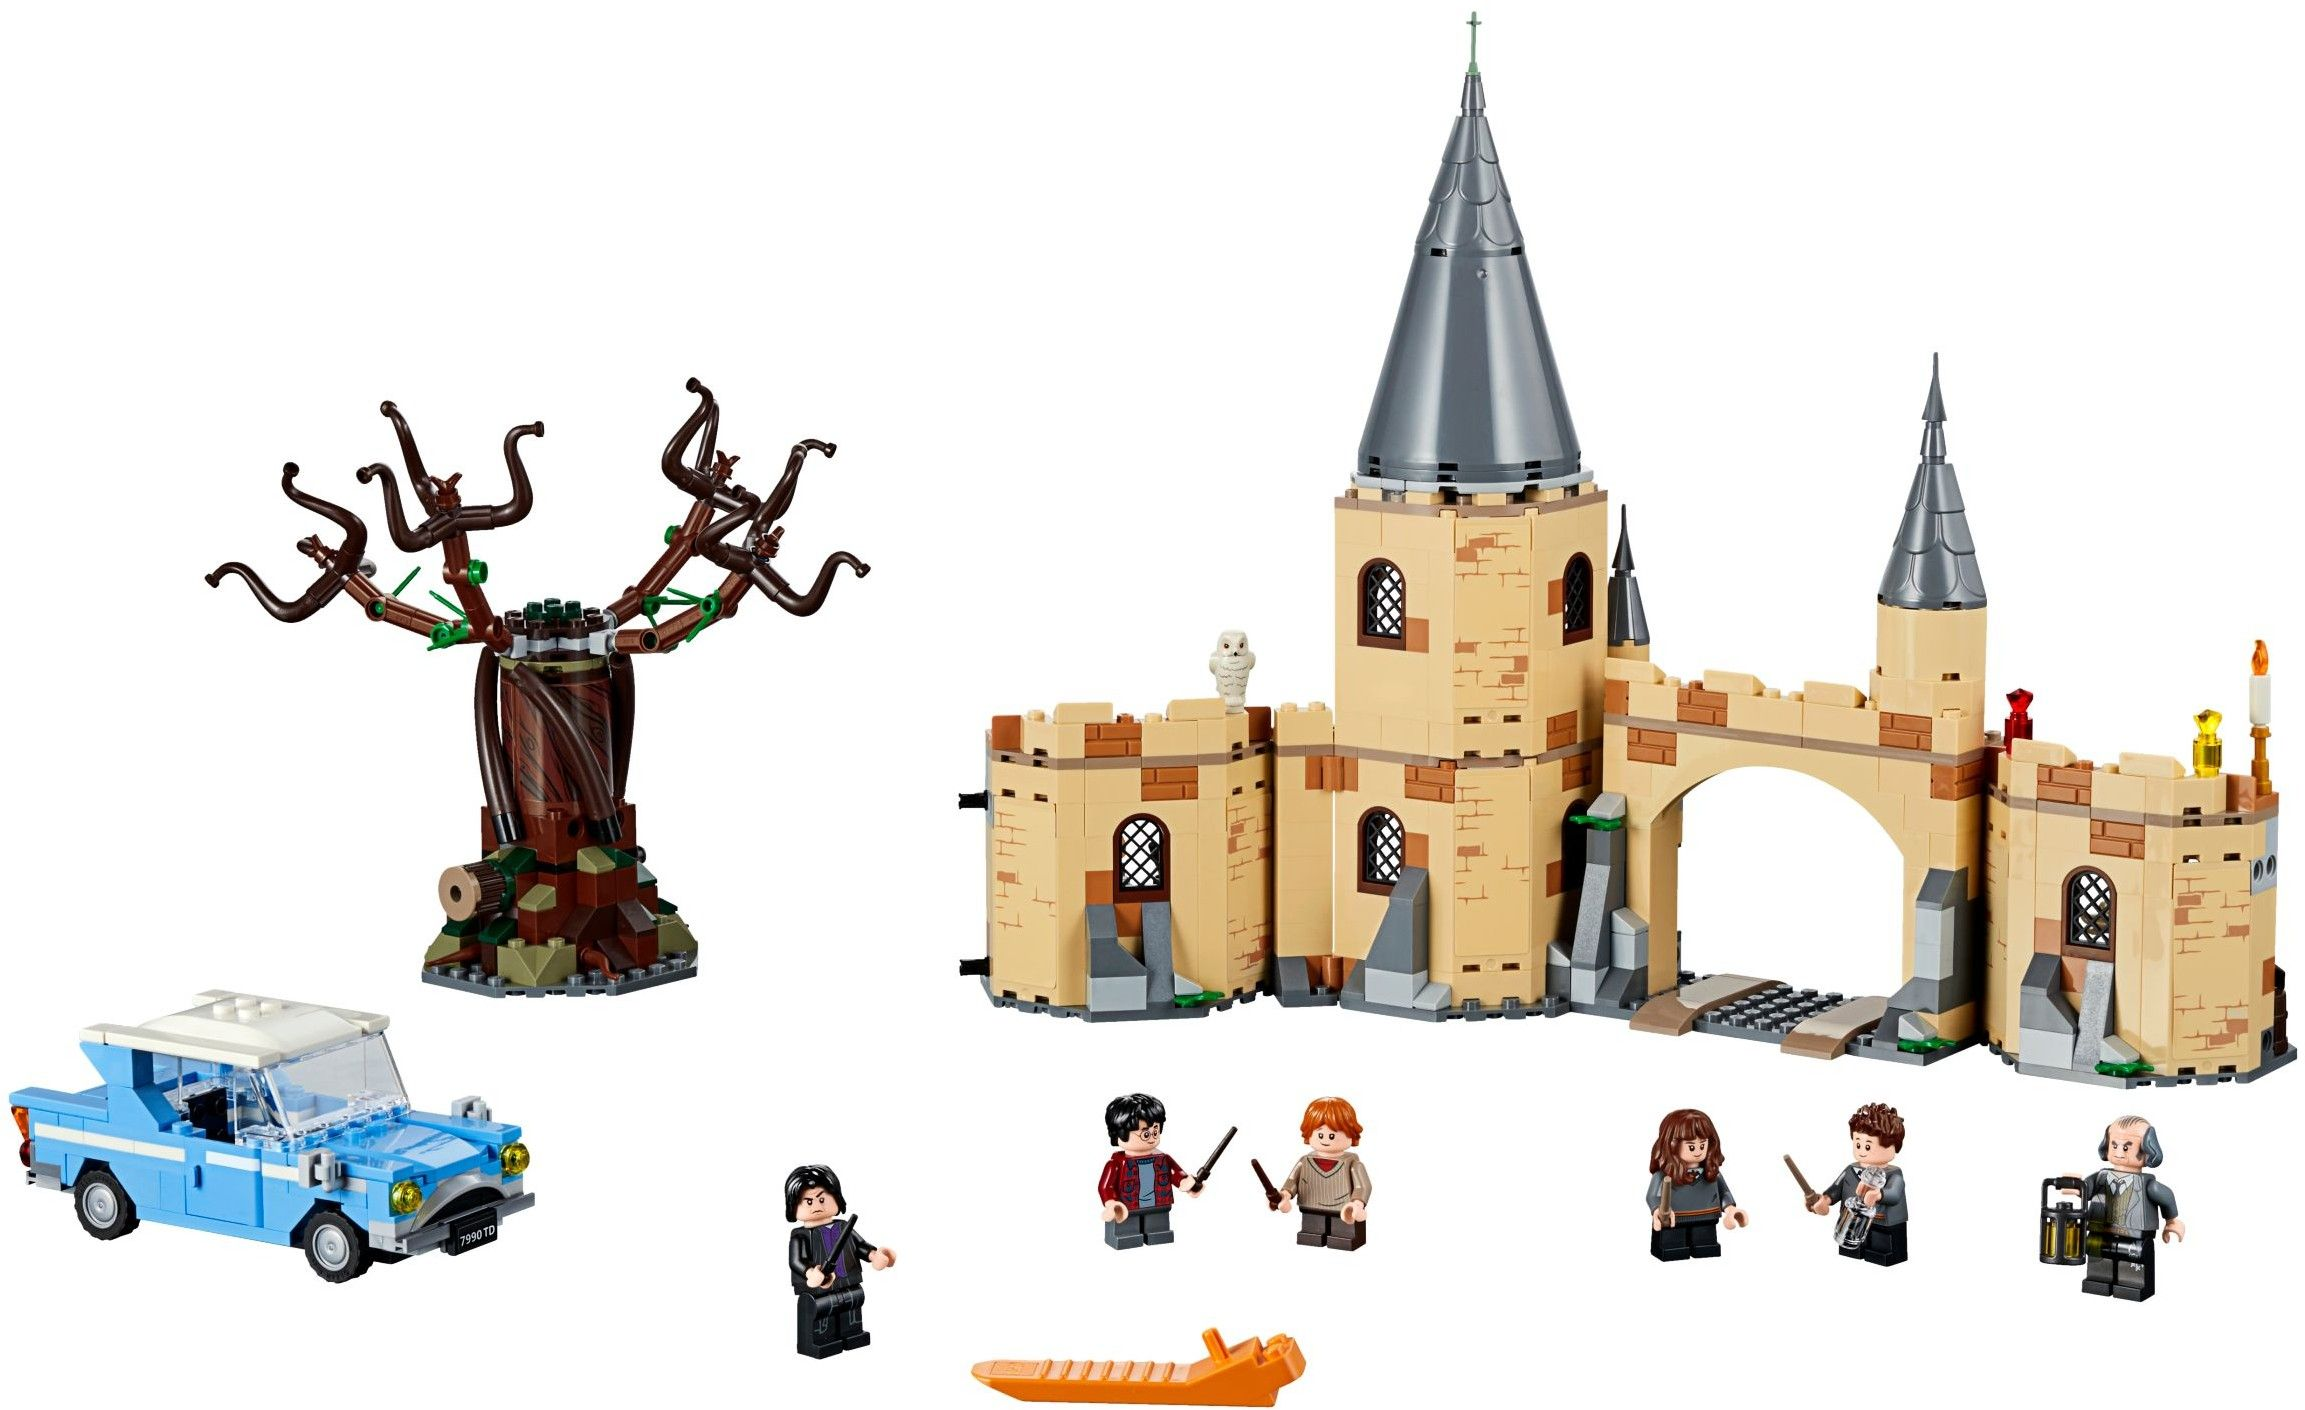 Pin By Wiki Brick On Wiki Brick Lego Hogwarts Lego Harry Potter Hogwarts